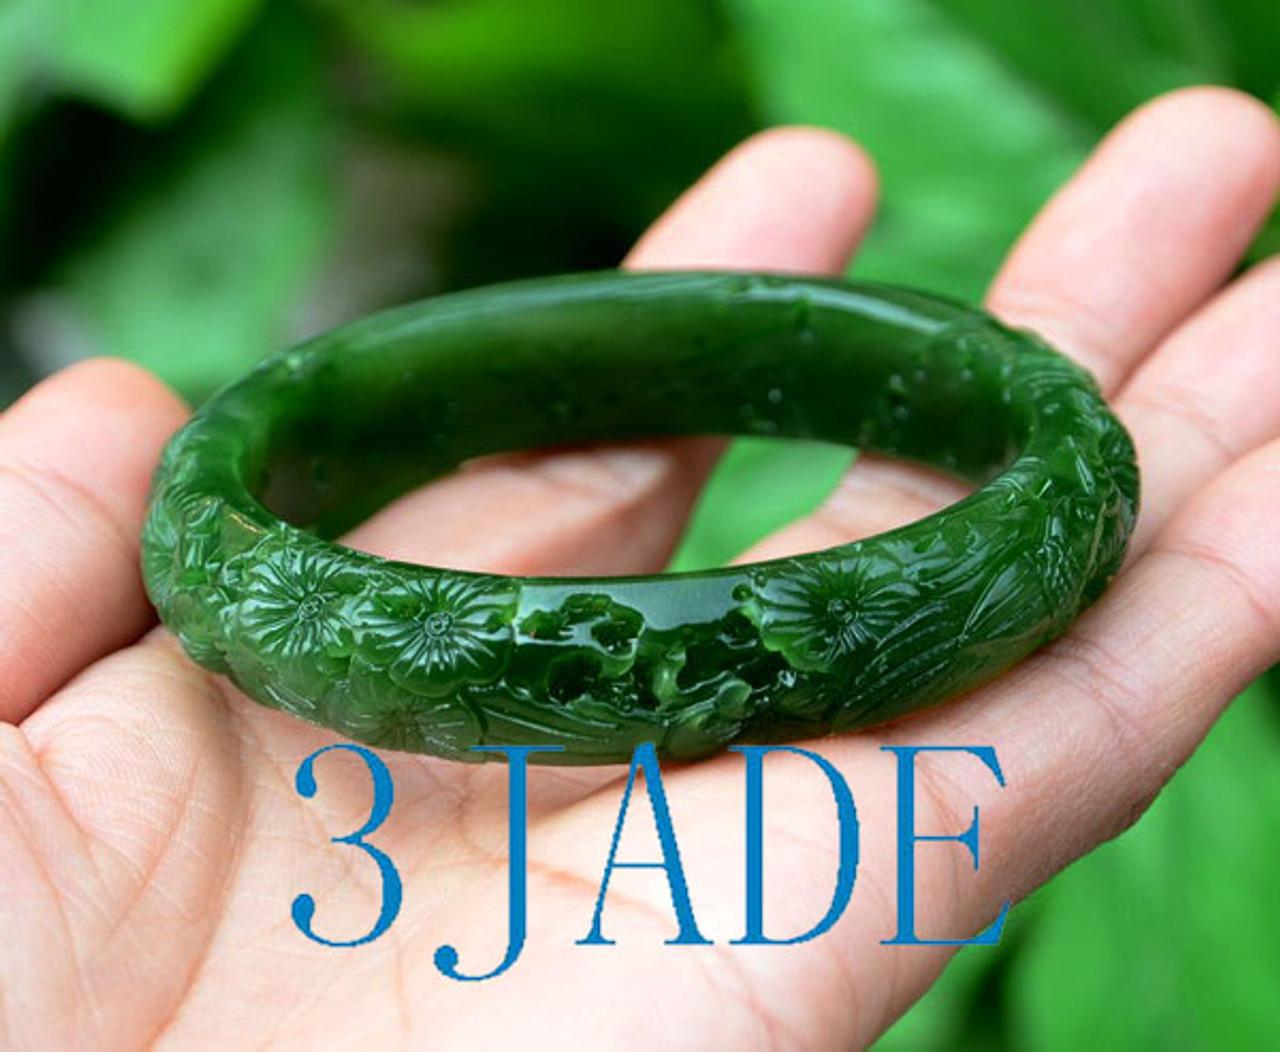 DJade-60mm Certified Natural Green A Jade Jadeite Bangle \u624b\u956f